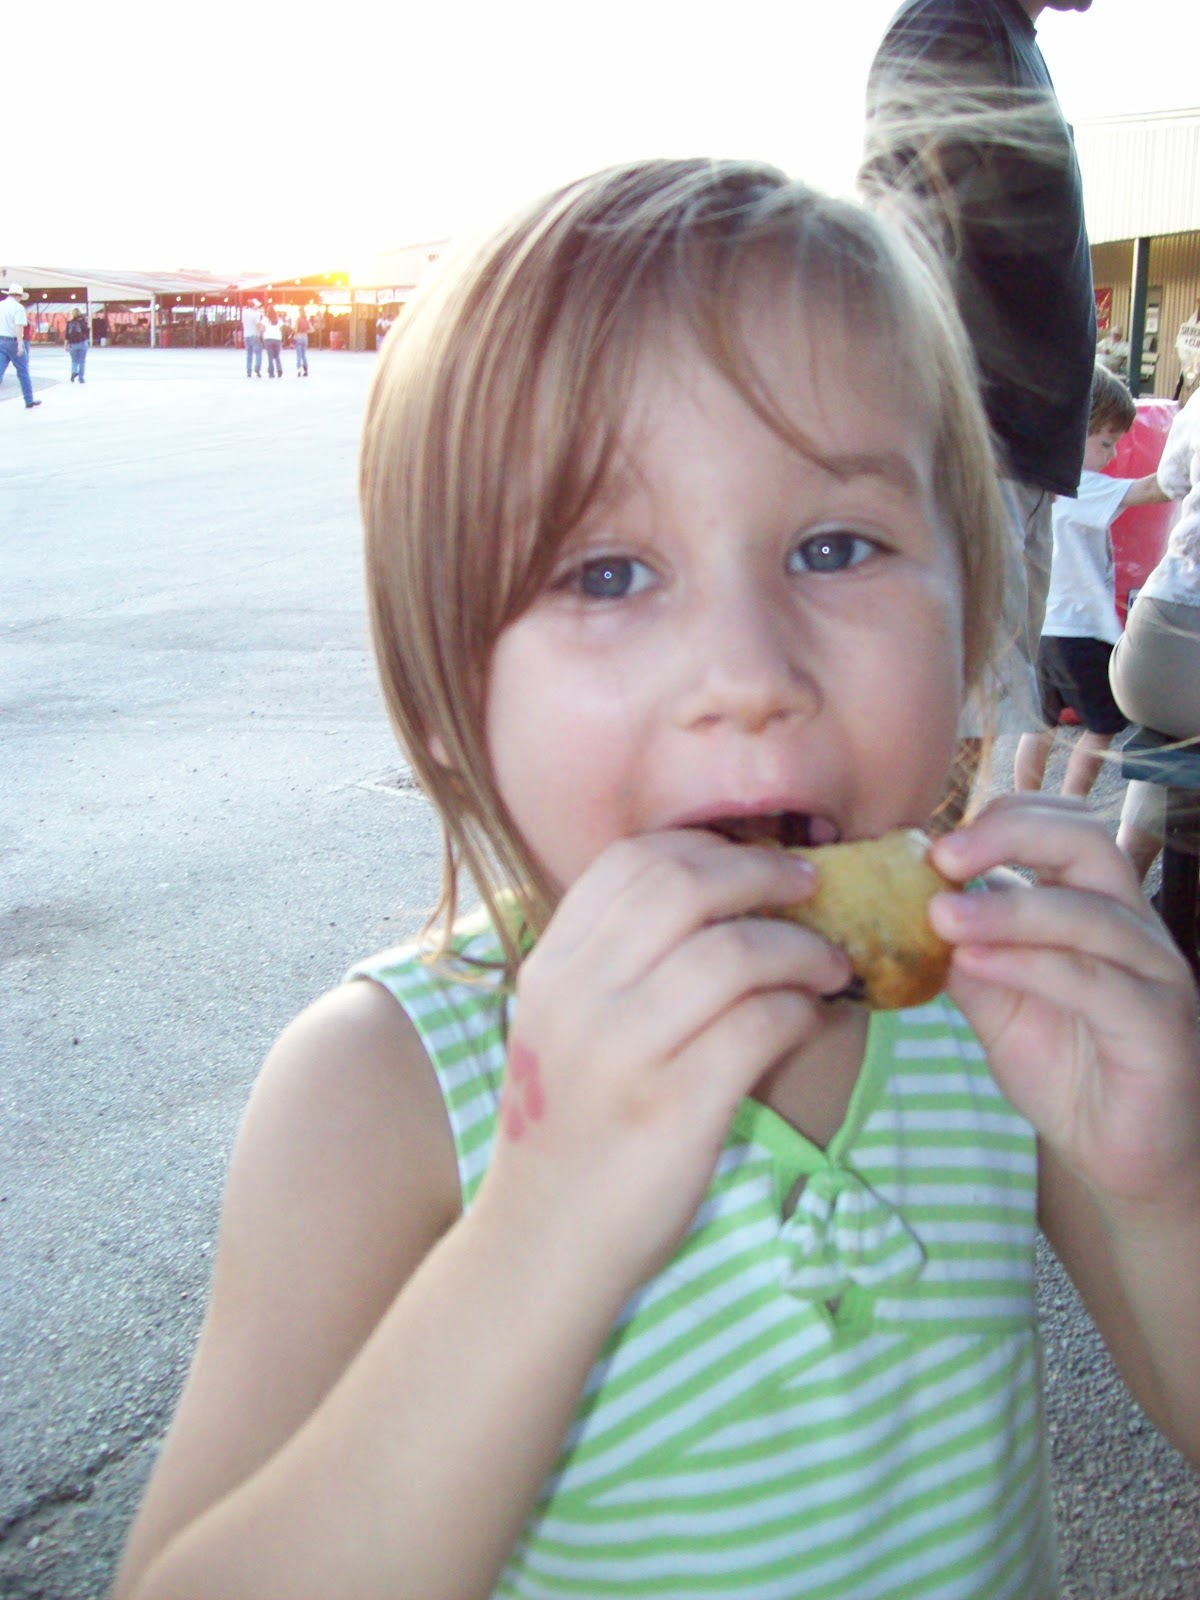 Fort Bend County Fair 2008 - 101_0430.JPG